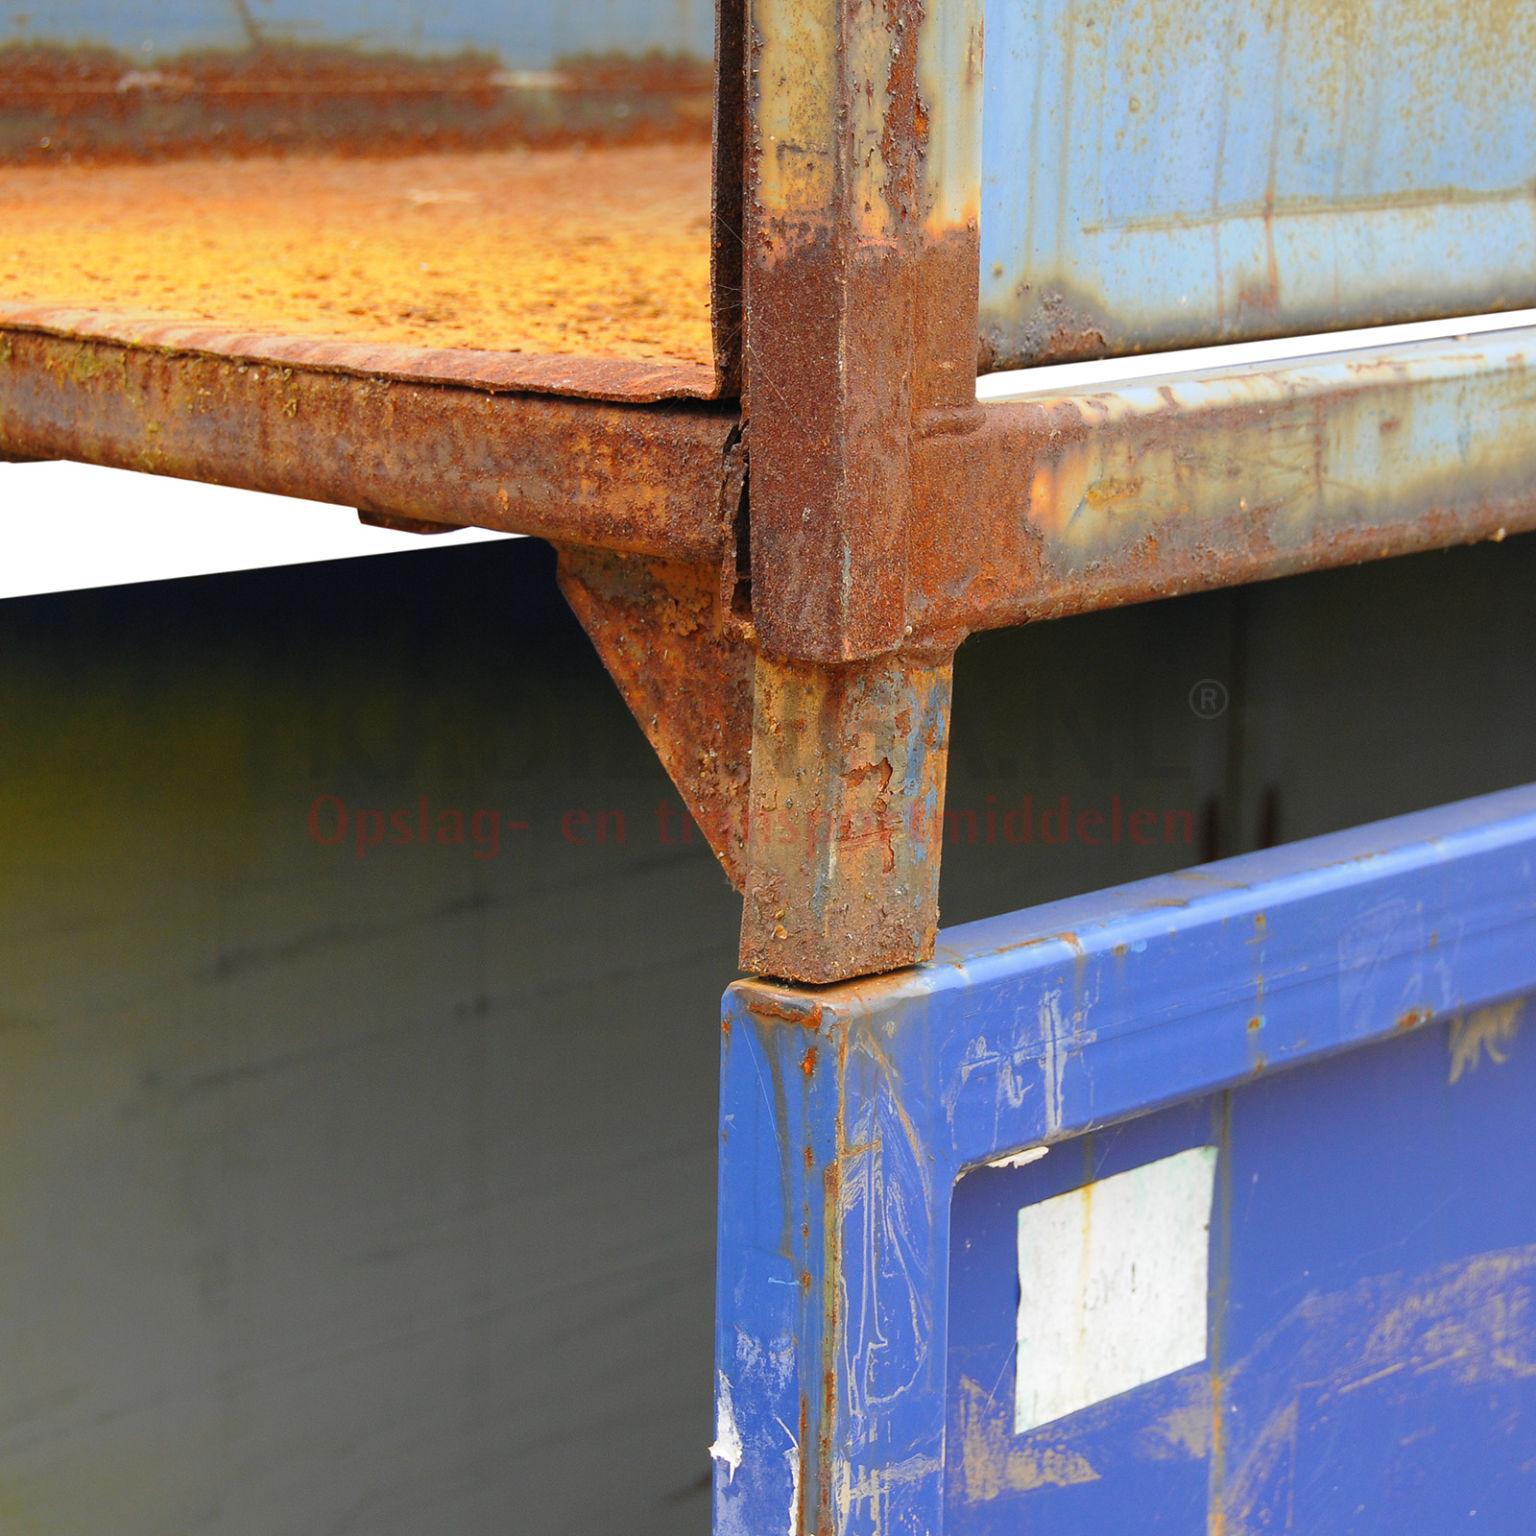 Chariot pour charges longues construction compact for Construction container belgique